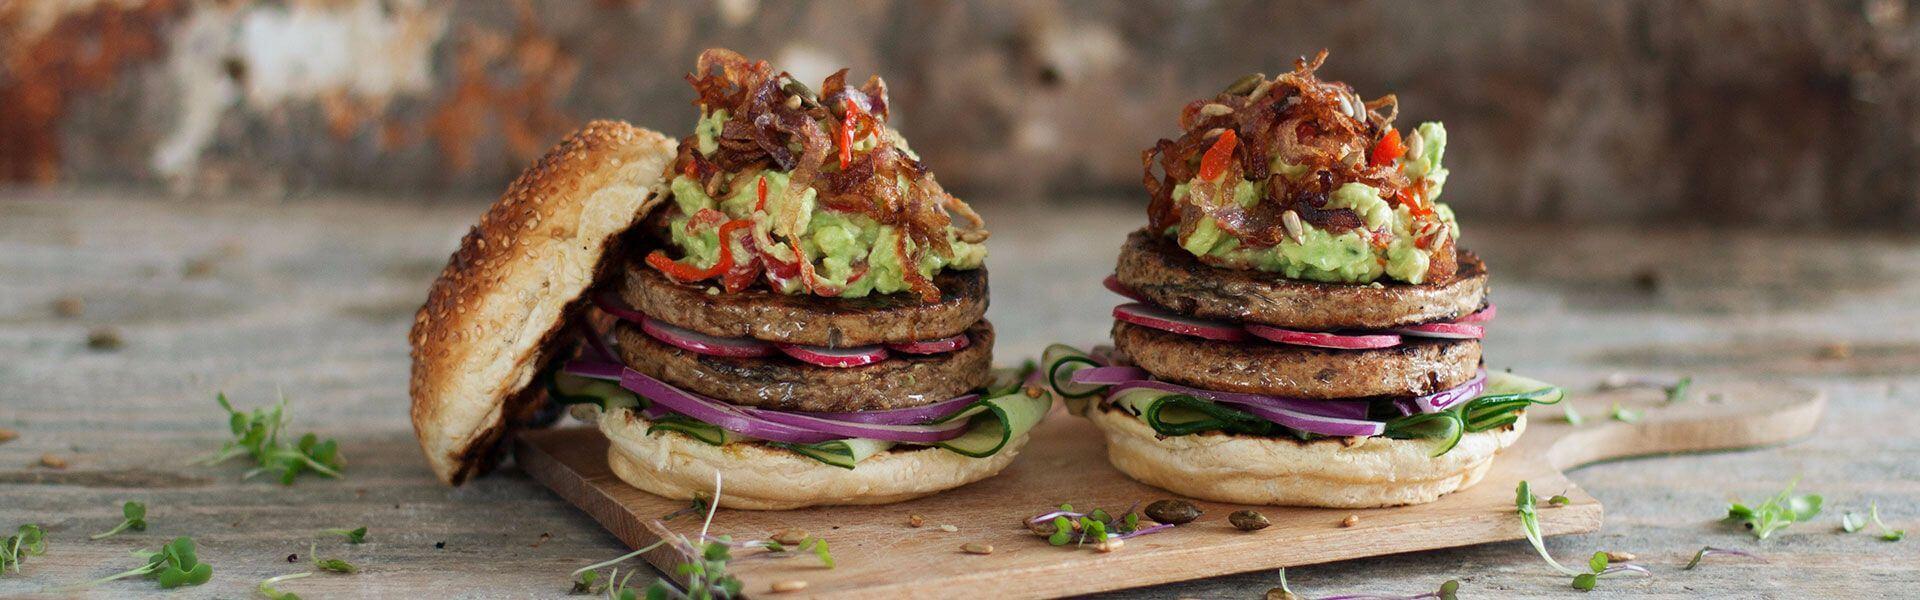 frys_pof_trad_burger